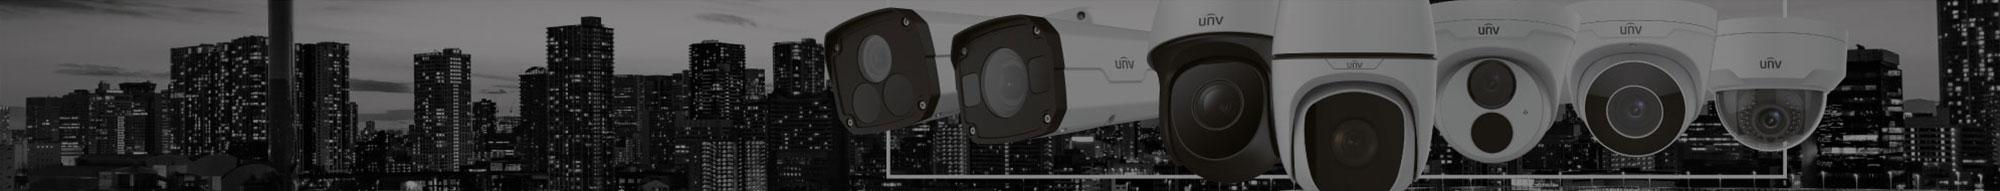 banner-seguridad-electronica2